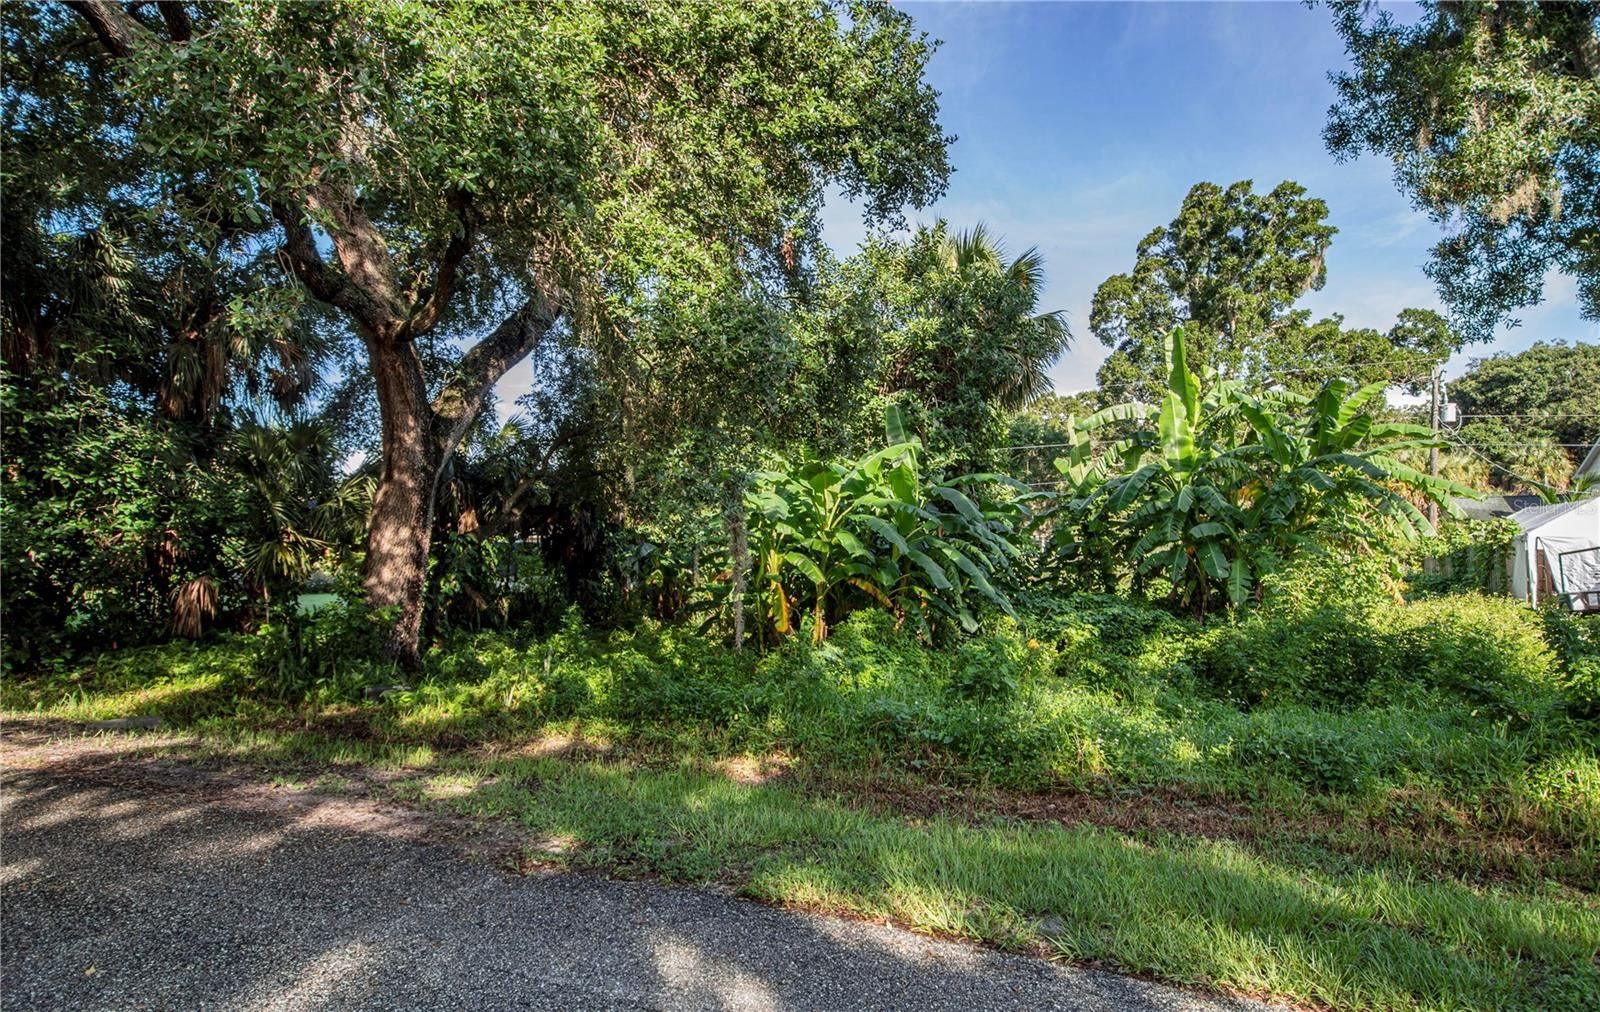 Photo of AVALON ROAD, VENICE, FL 34293 (MLS # D6121239)